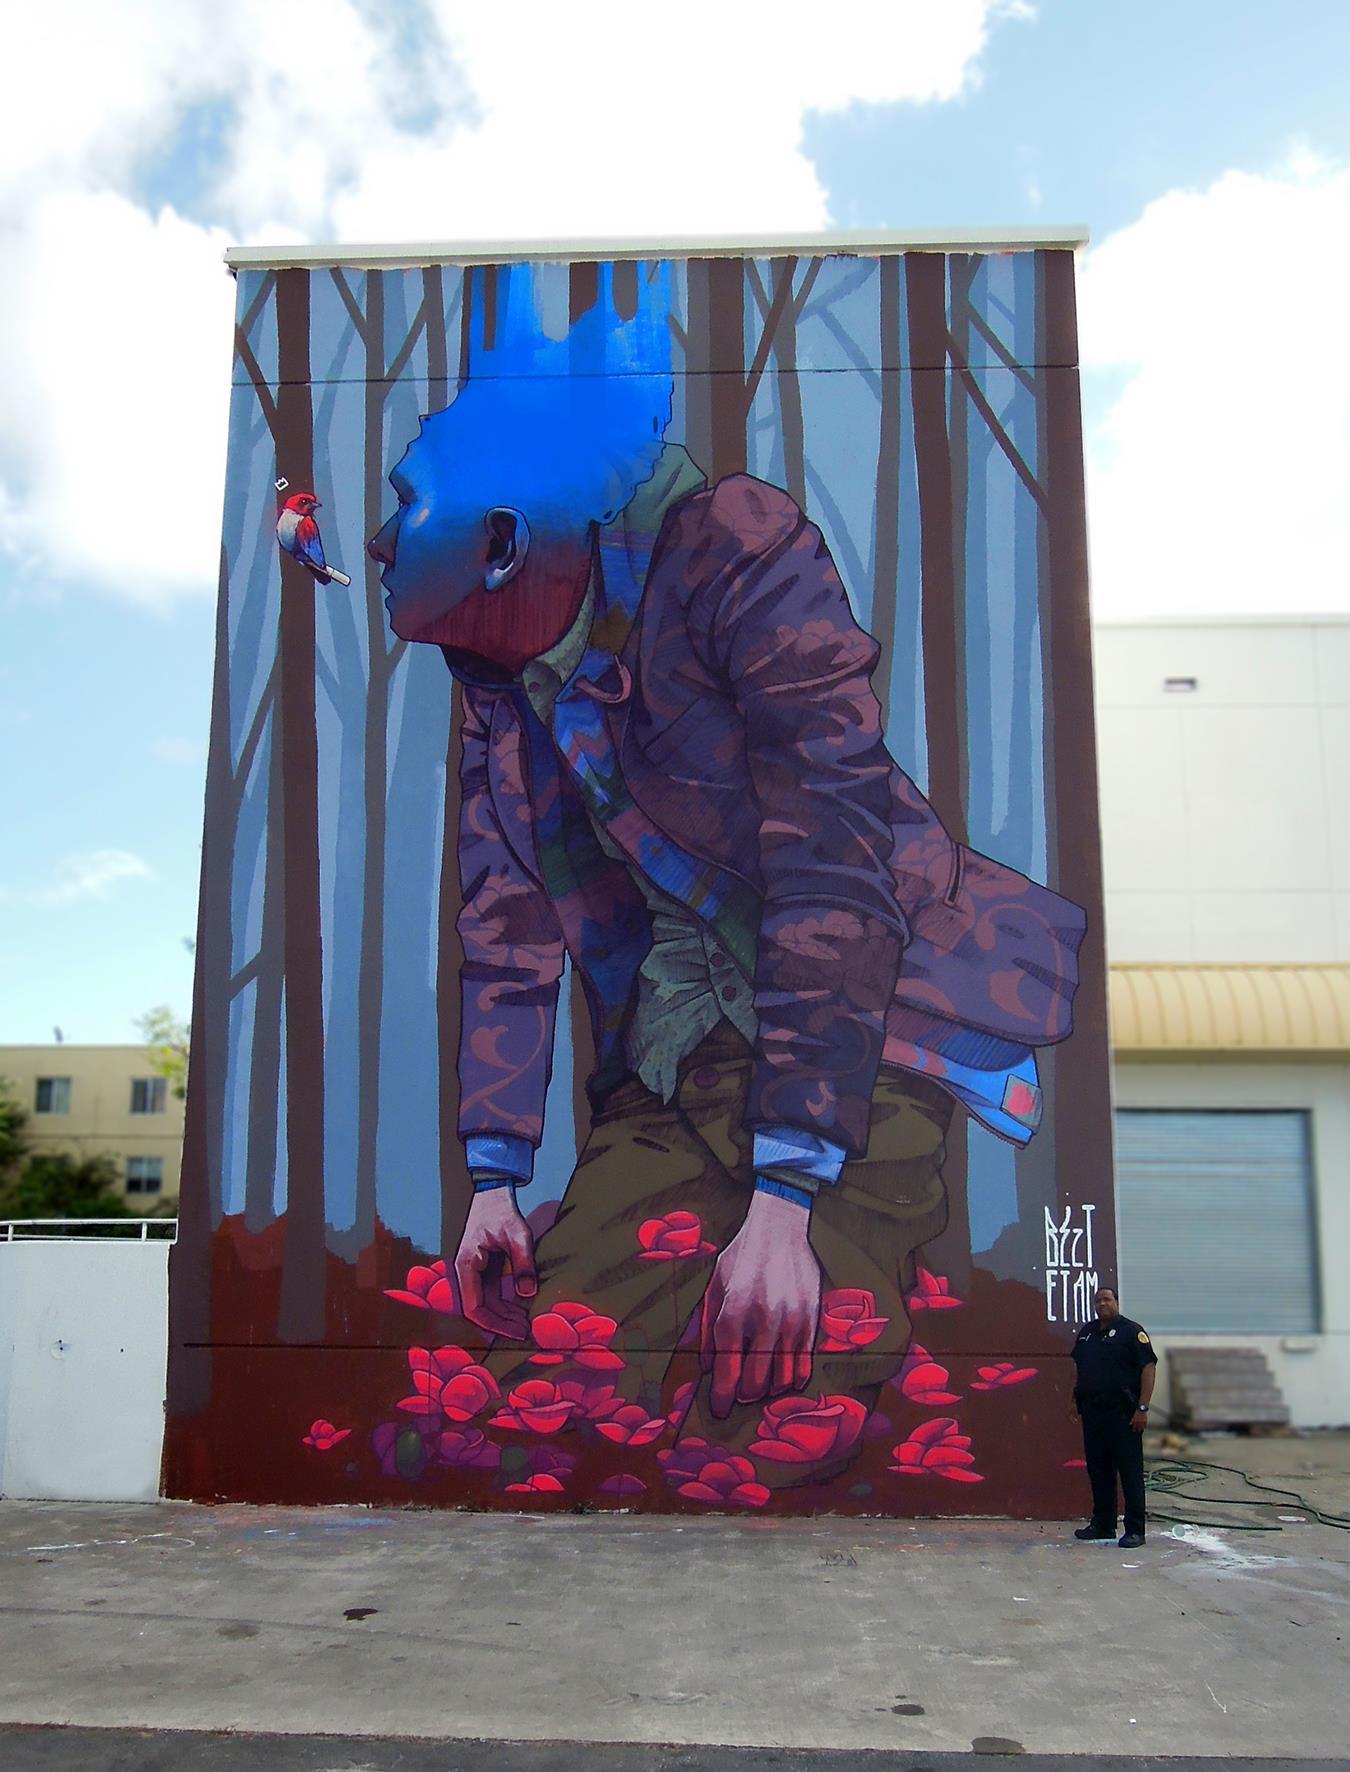 etam-cru-bezt-sainer-street-art-large-murals-18